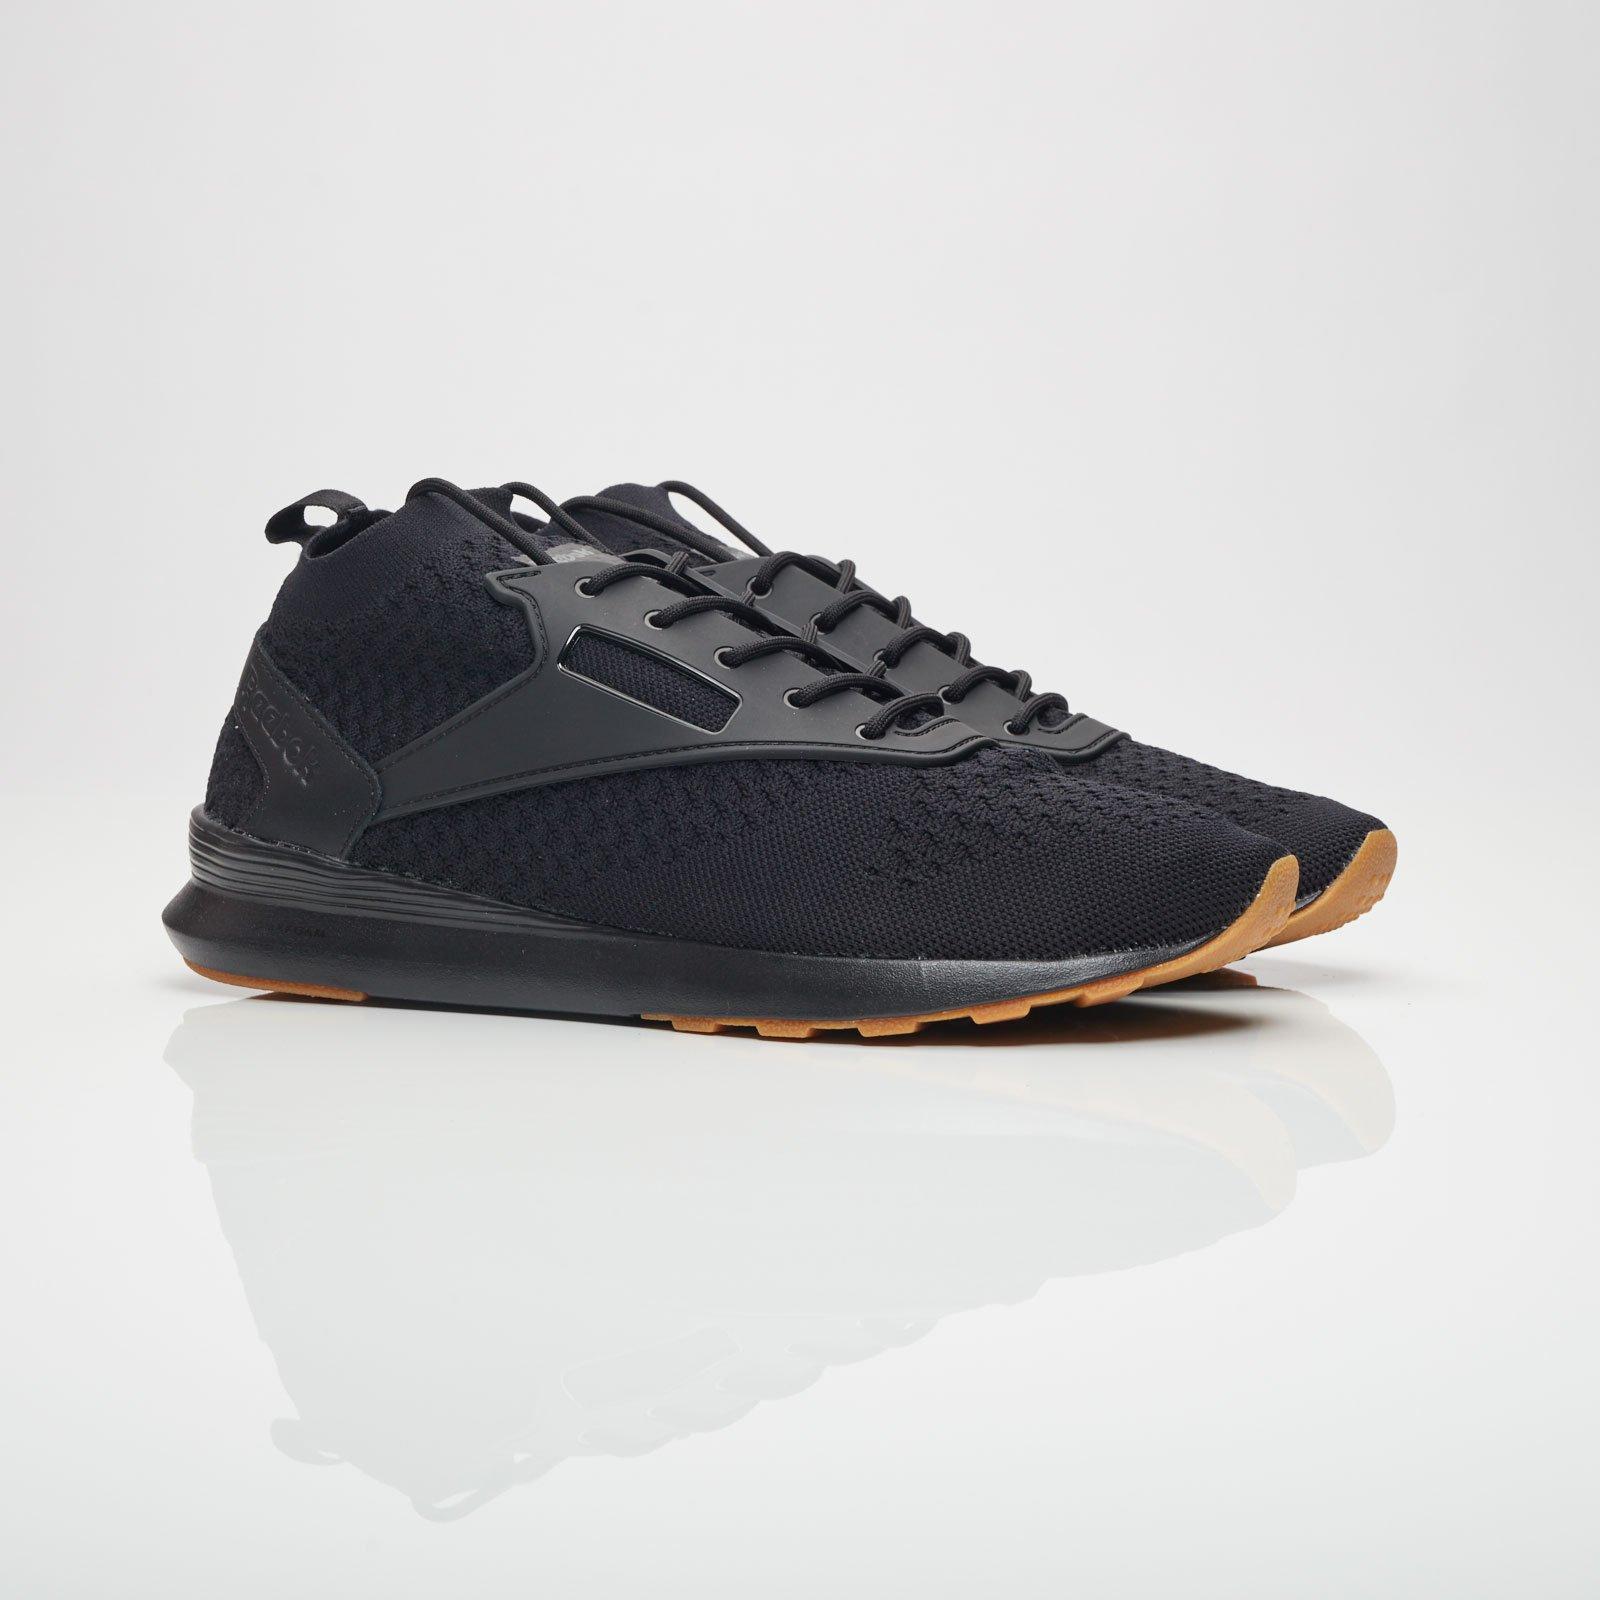 adidas Originals Black Reebok Classic Edition Zoku Runner Utlk Sneakers xeKKFYC